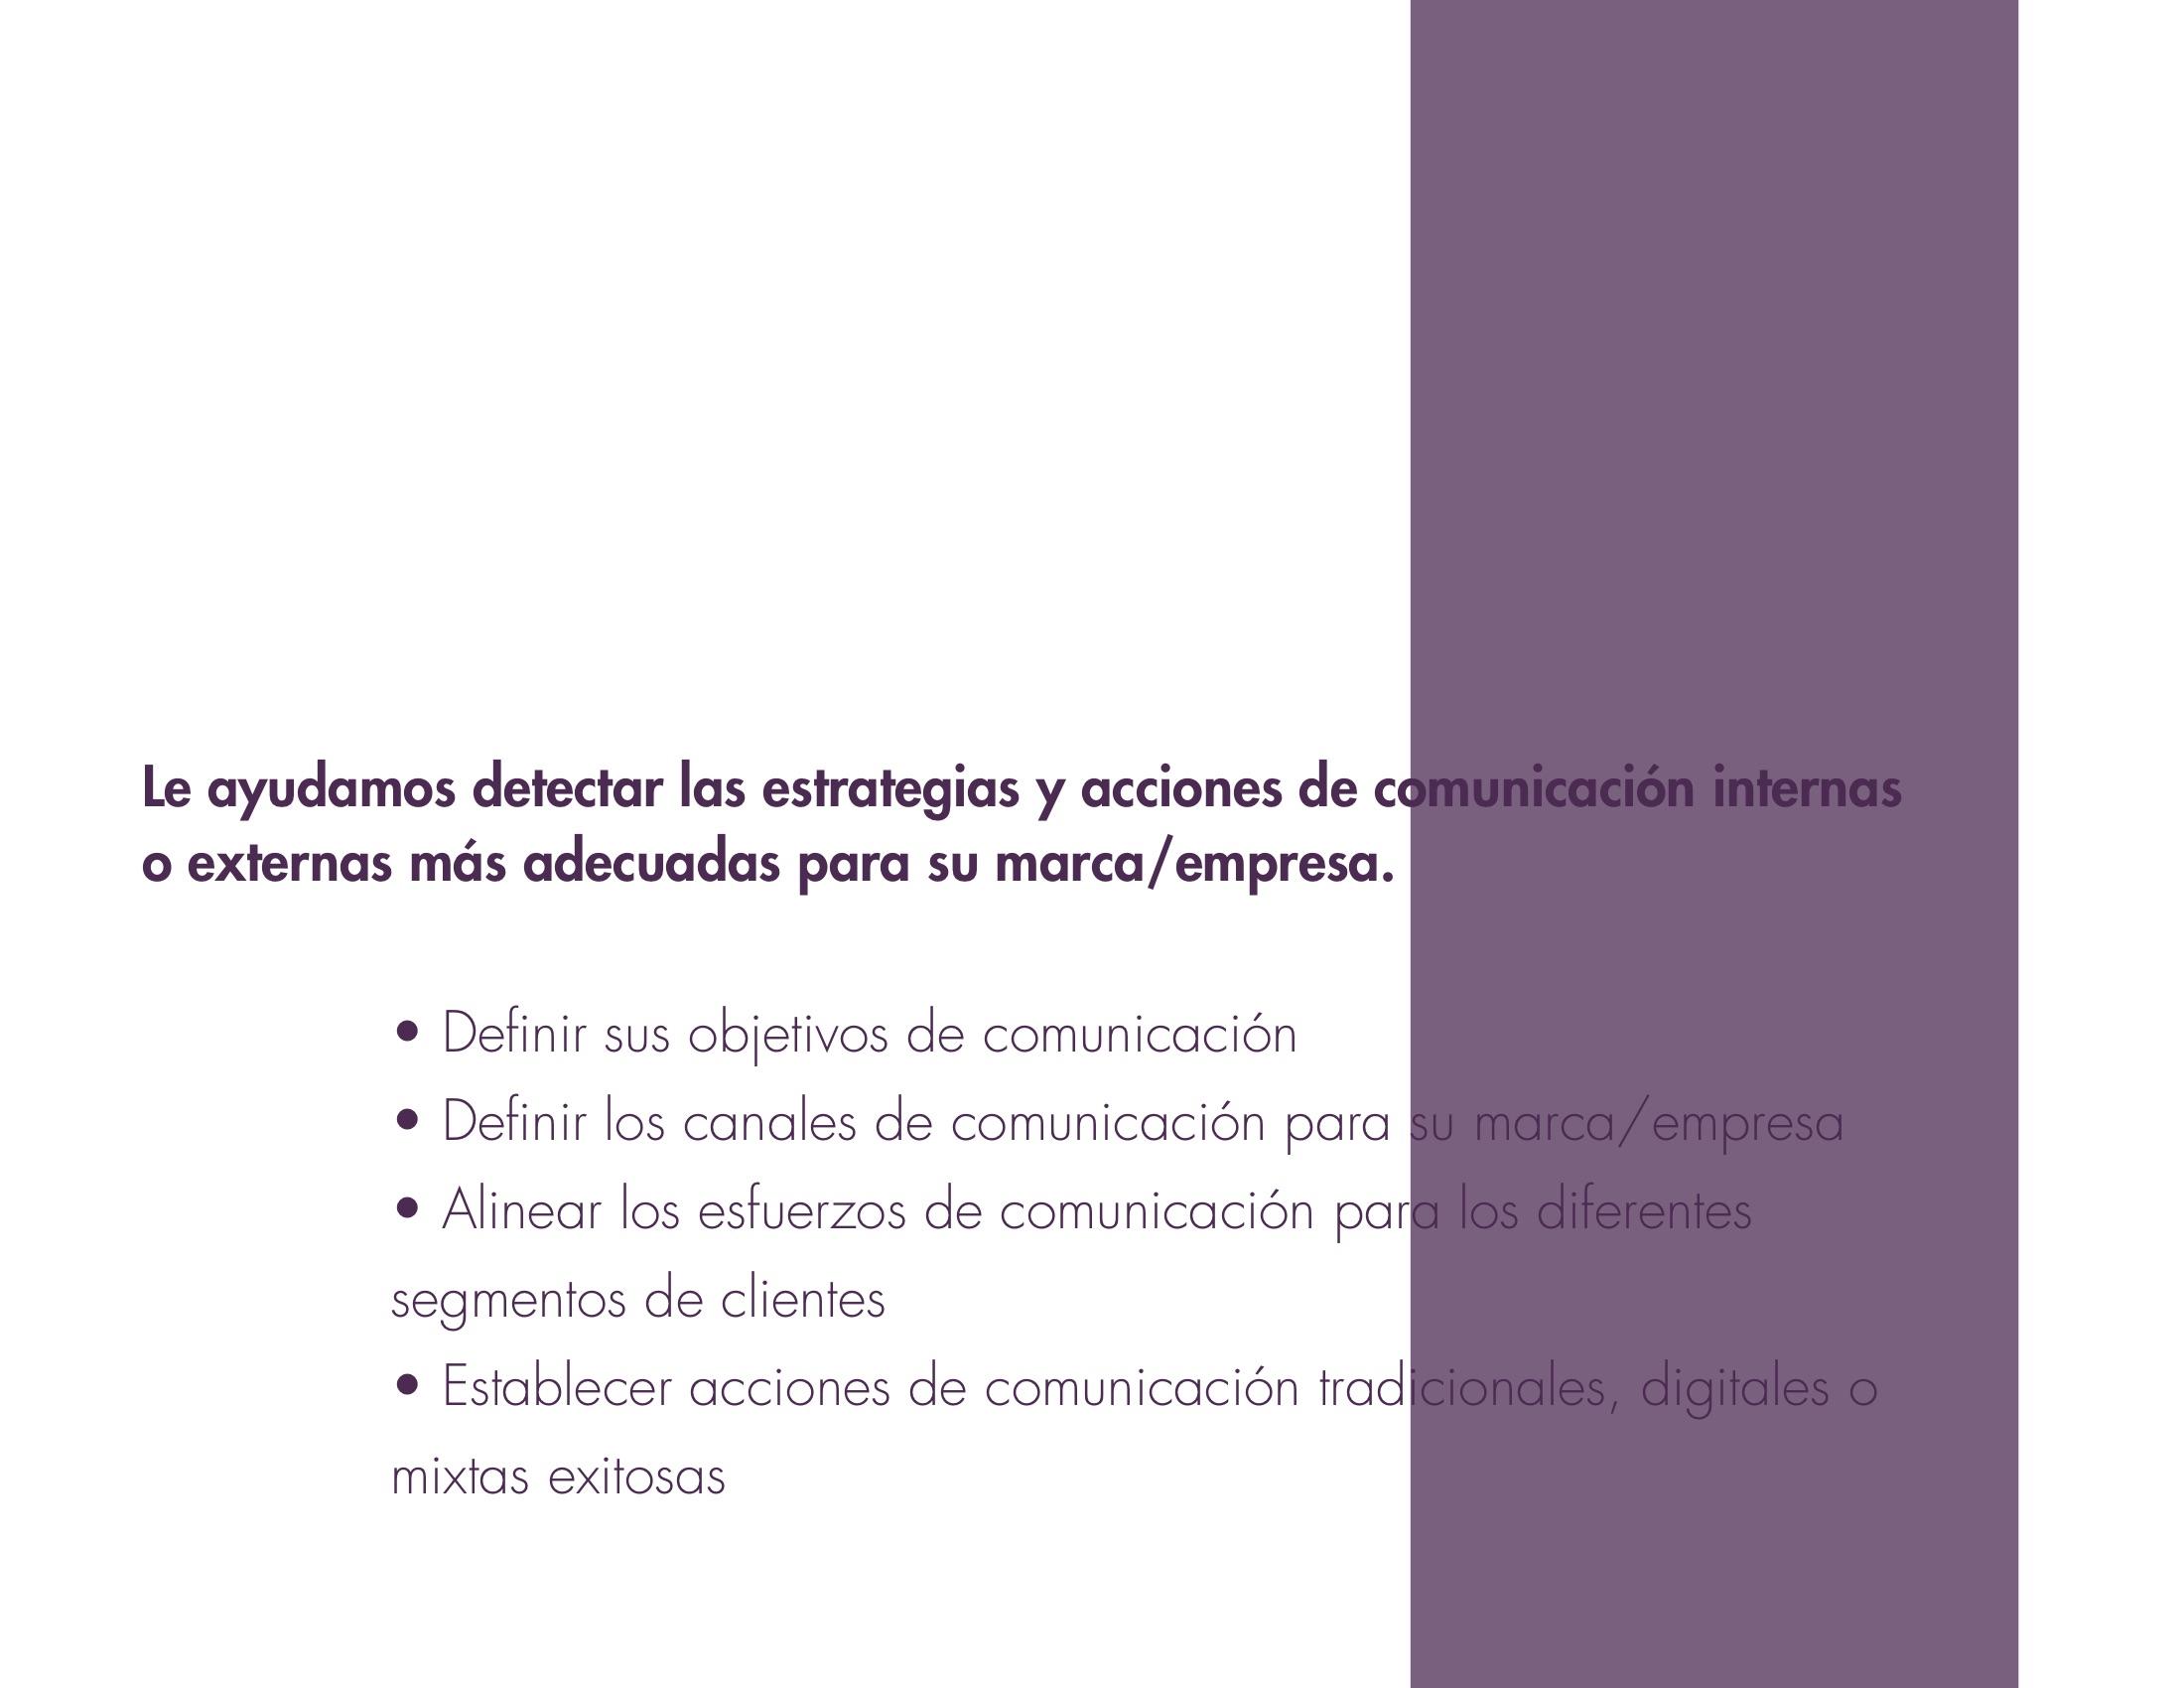 KREO_PRESENTACION13.jpg